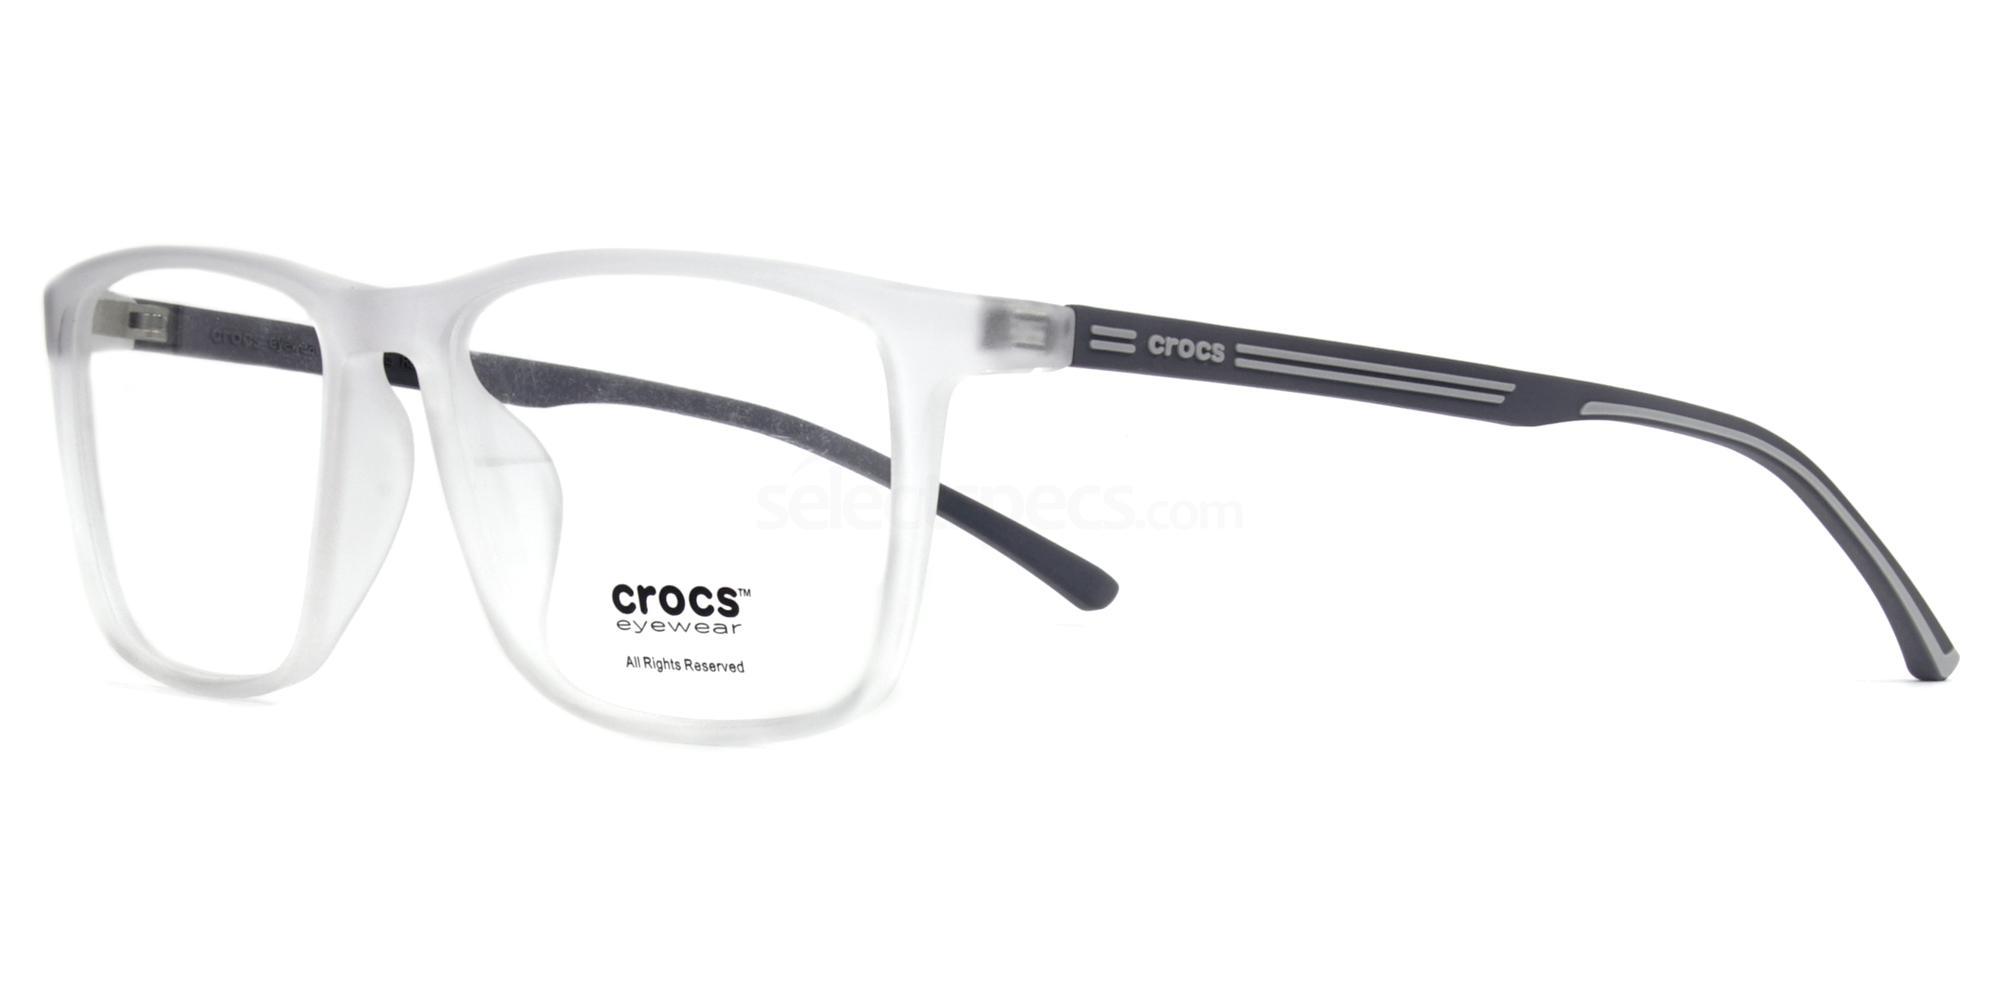 00GY CF3098 Glasses, Crocs Eyewear